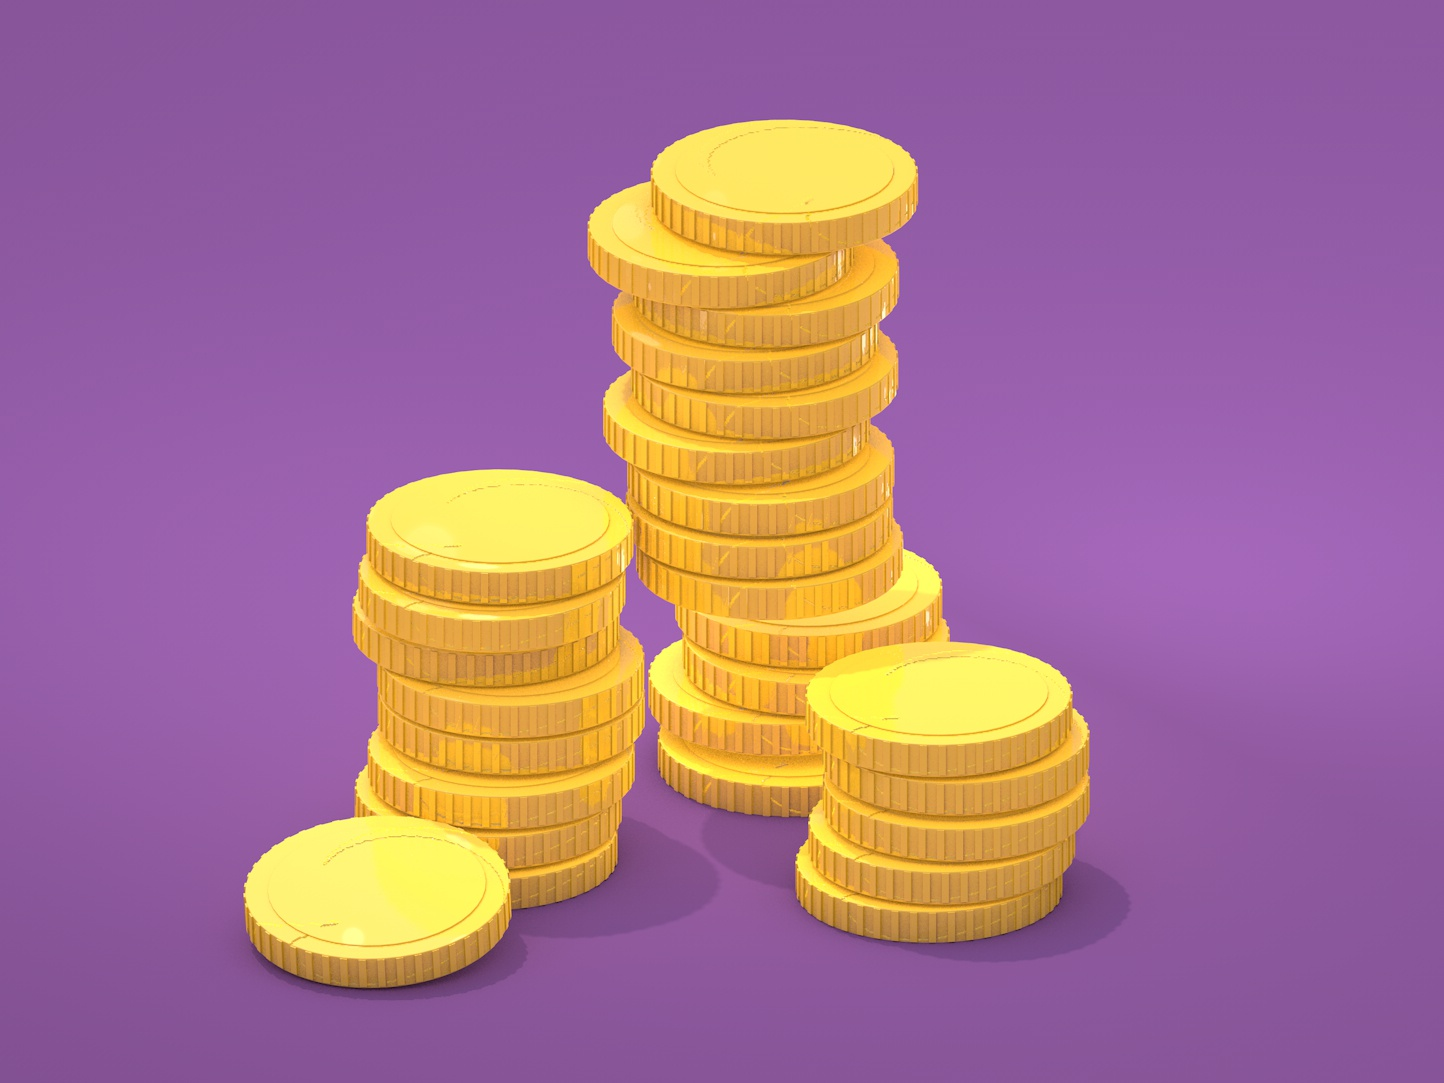 Funny Coins ui c4d modelling cartoon digitalart illustration design lowpoly isometric render cinema4d